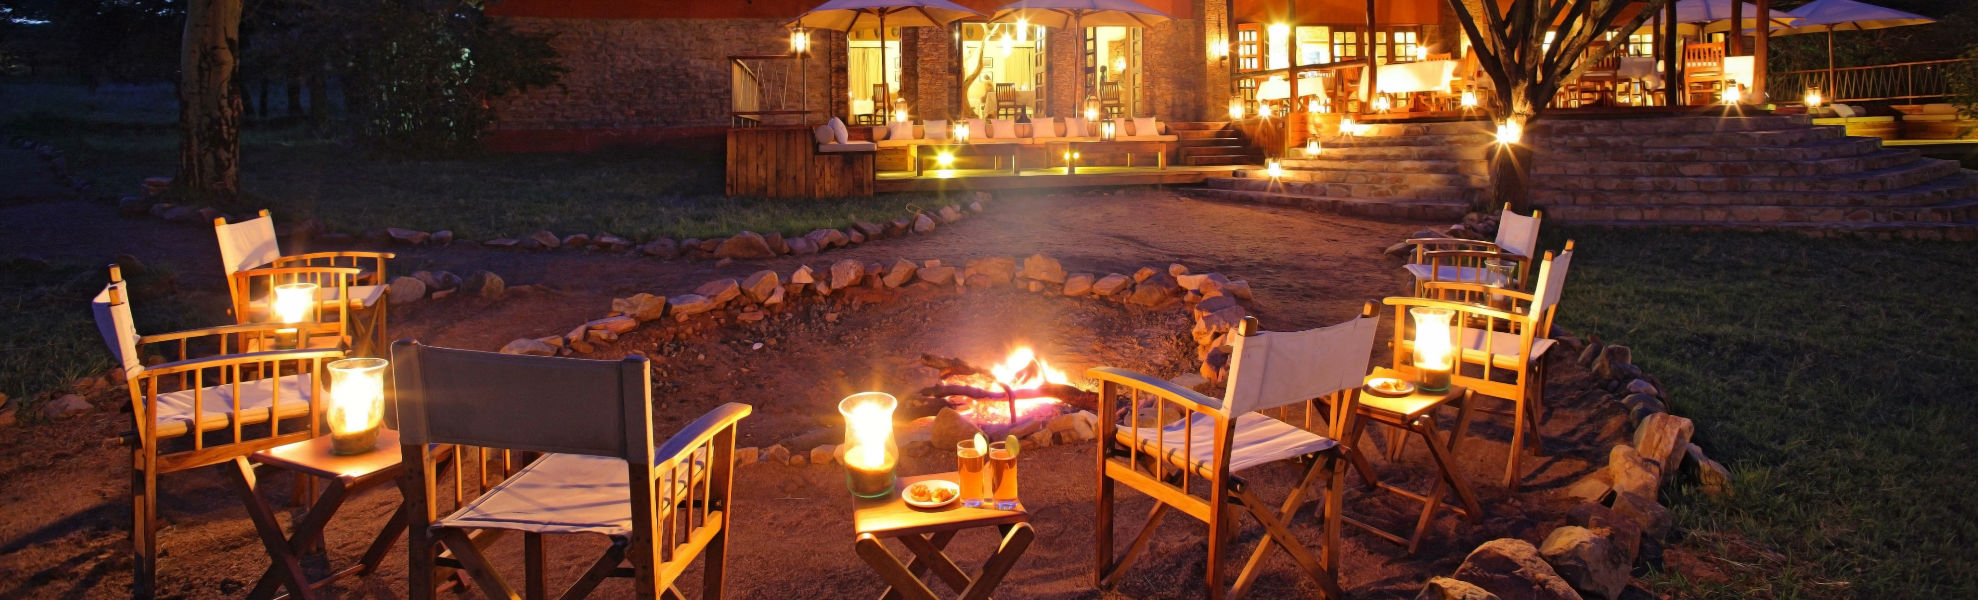 Lagerfeuer im Mara Bushtops Camp im Masai Mara Schutzgebiet